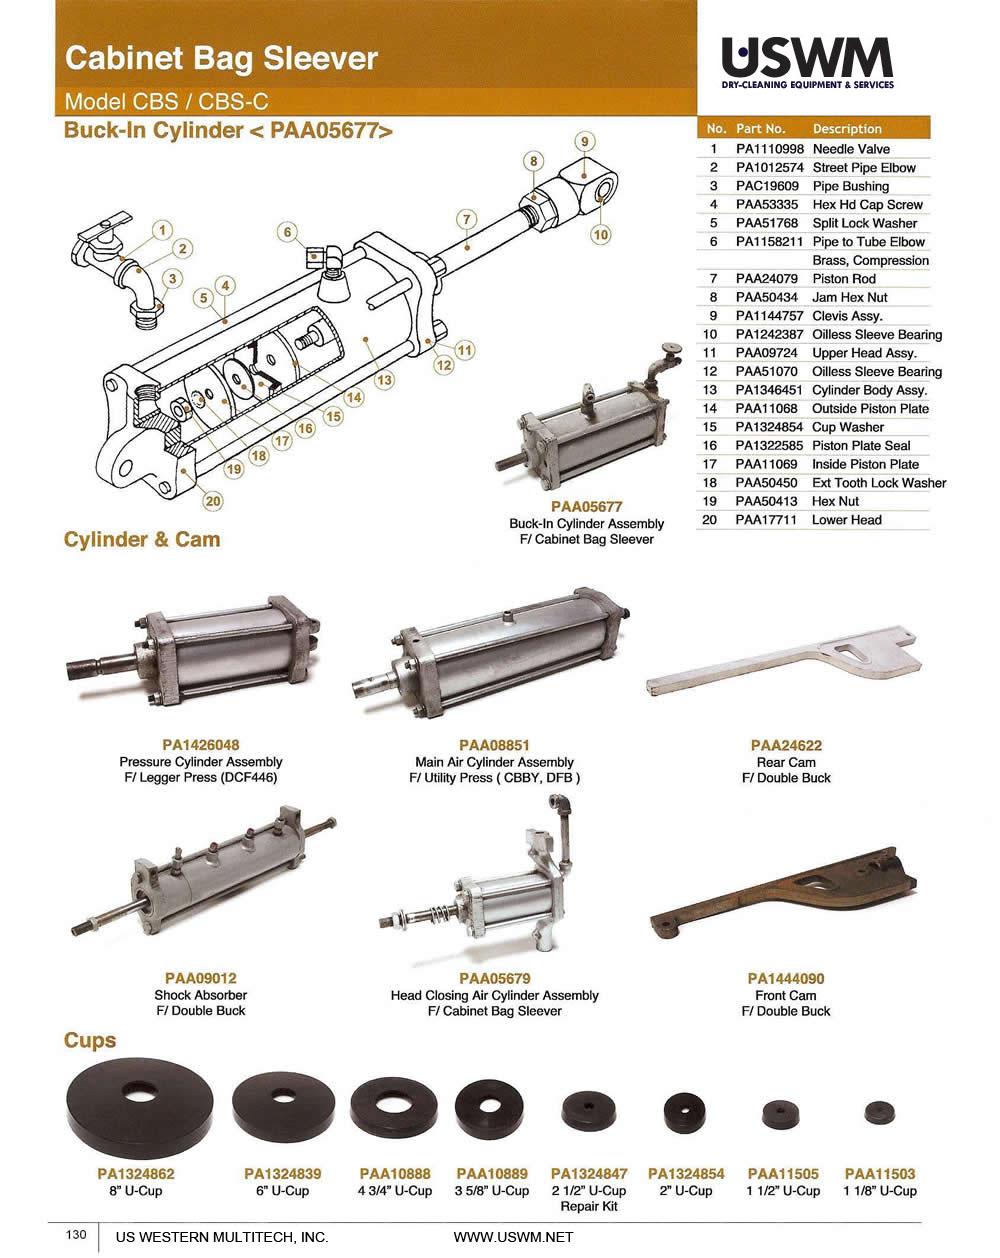 Ajax Cabinet Bag Sleever Parts, Buck-In Cylinder, Model CBS, CBS-